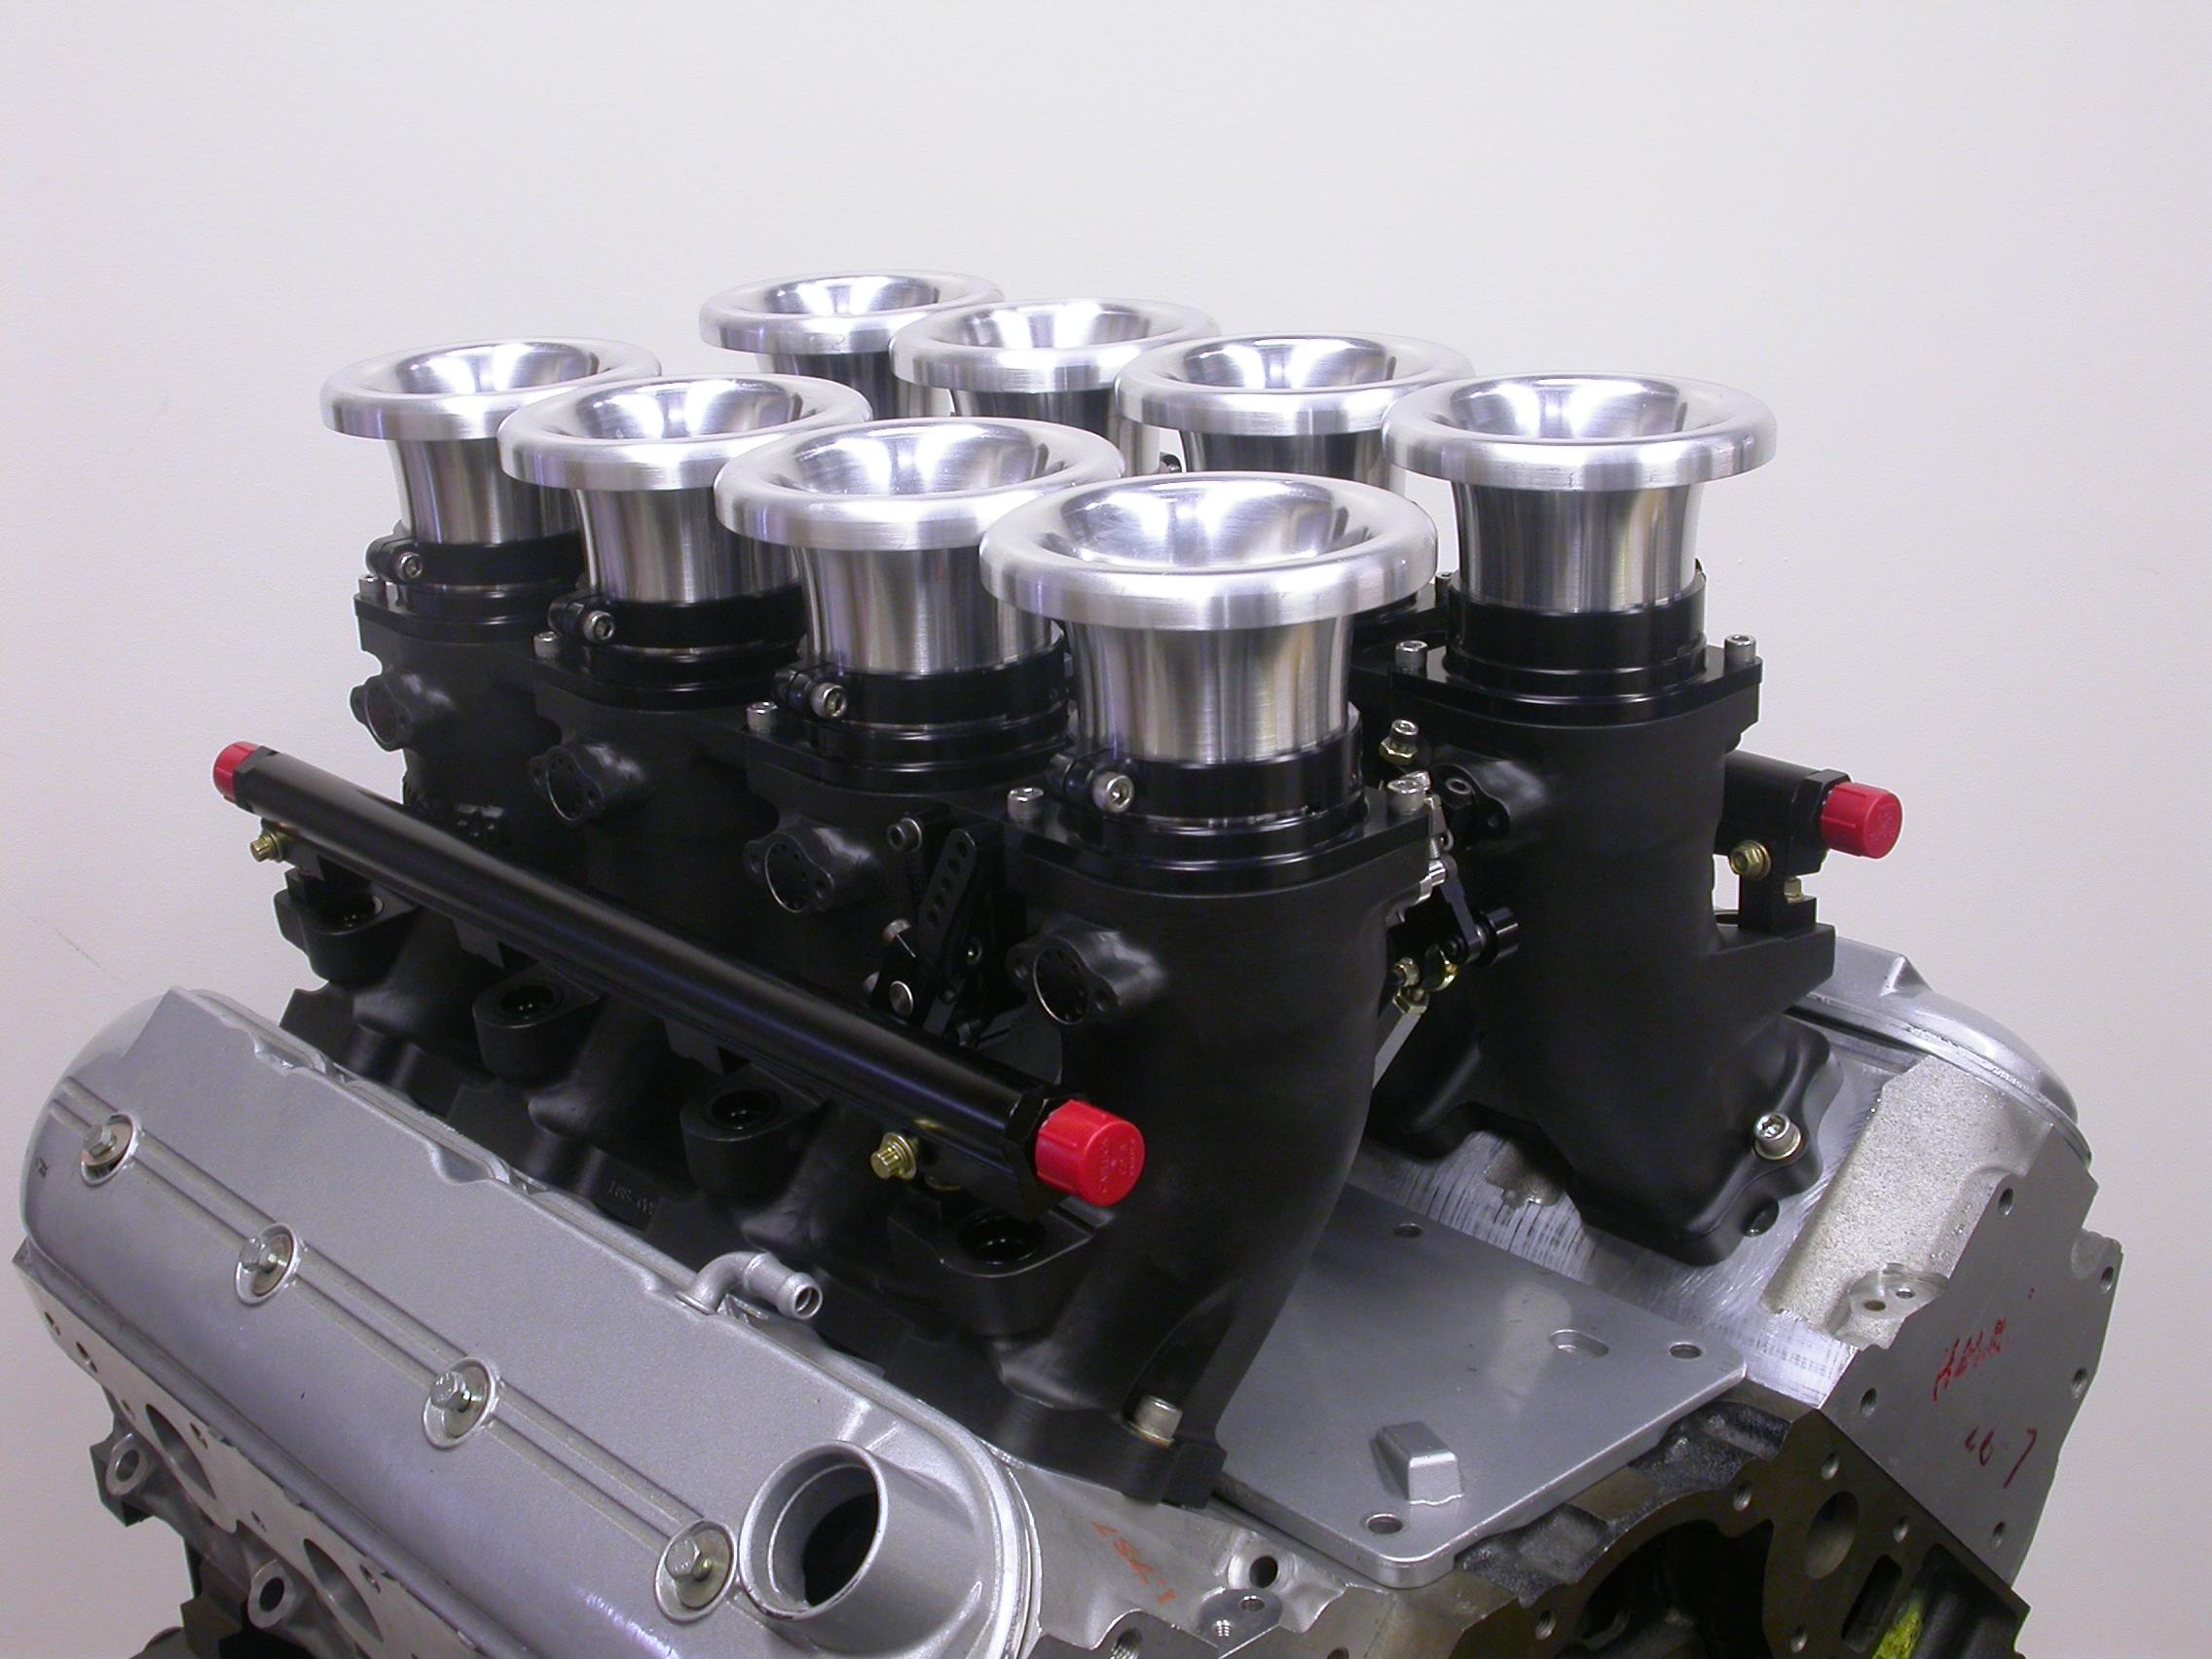 Ls7 Sprint Bbc Manifold General Motors Racing Manifolds